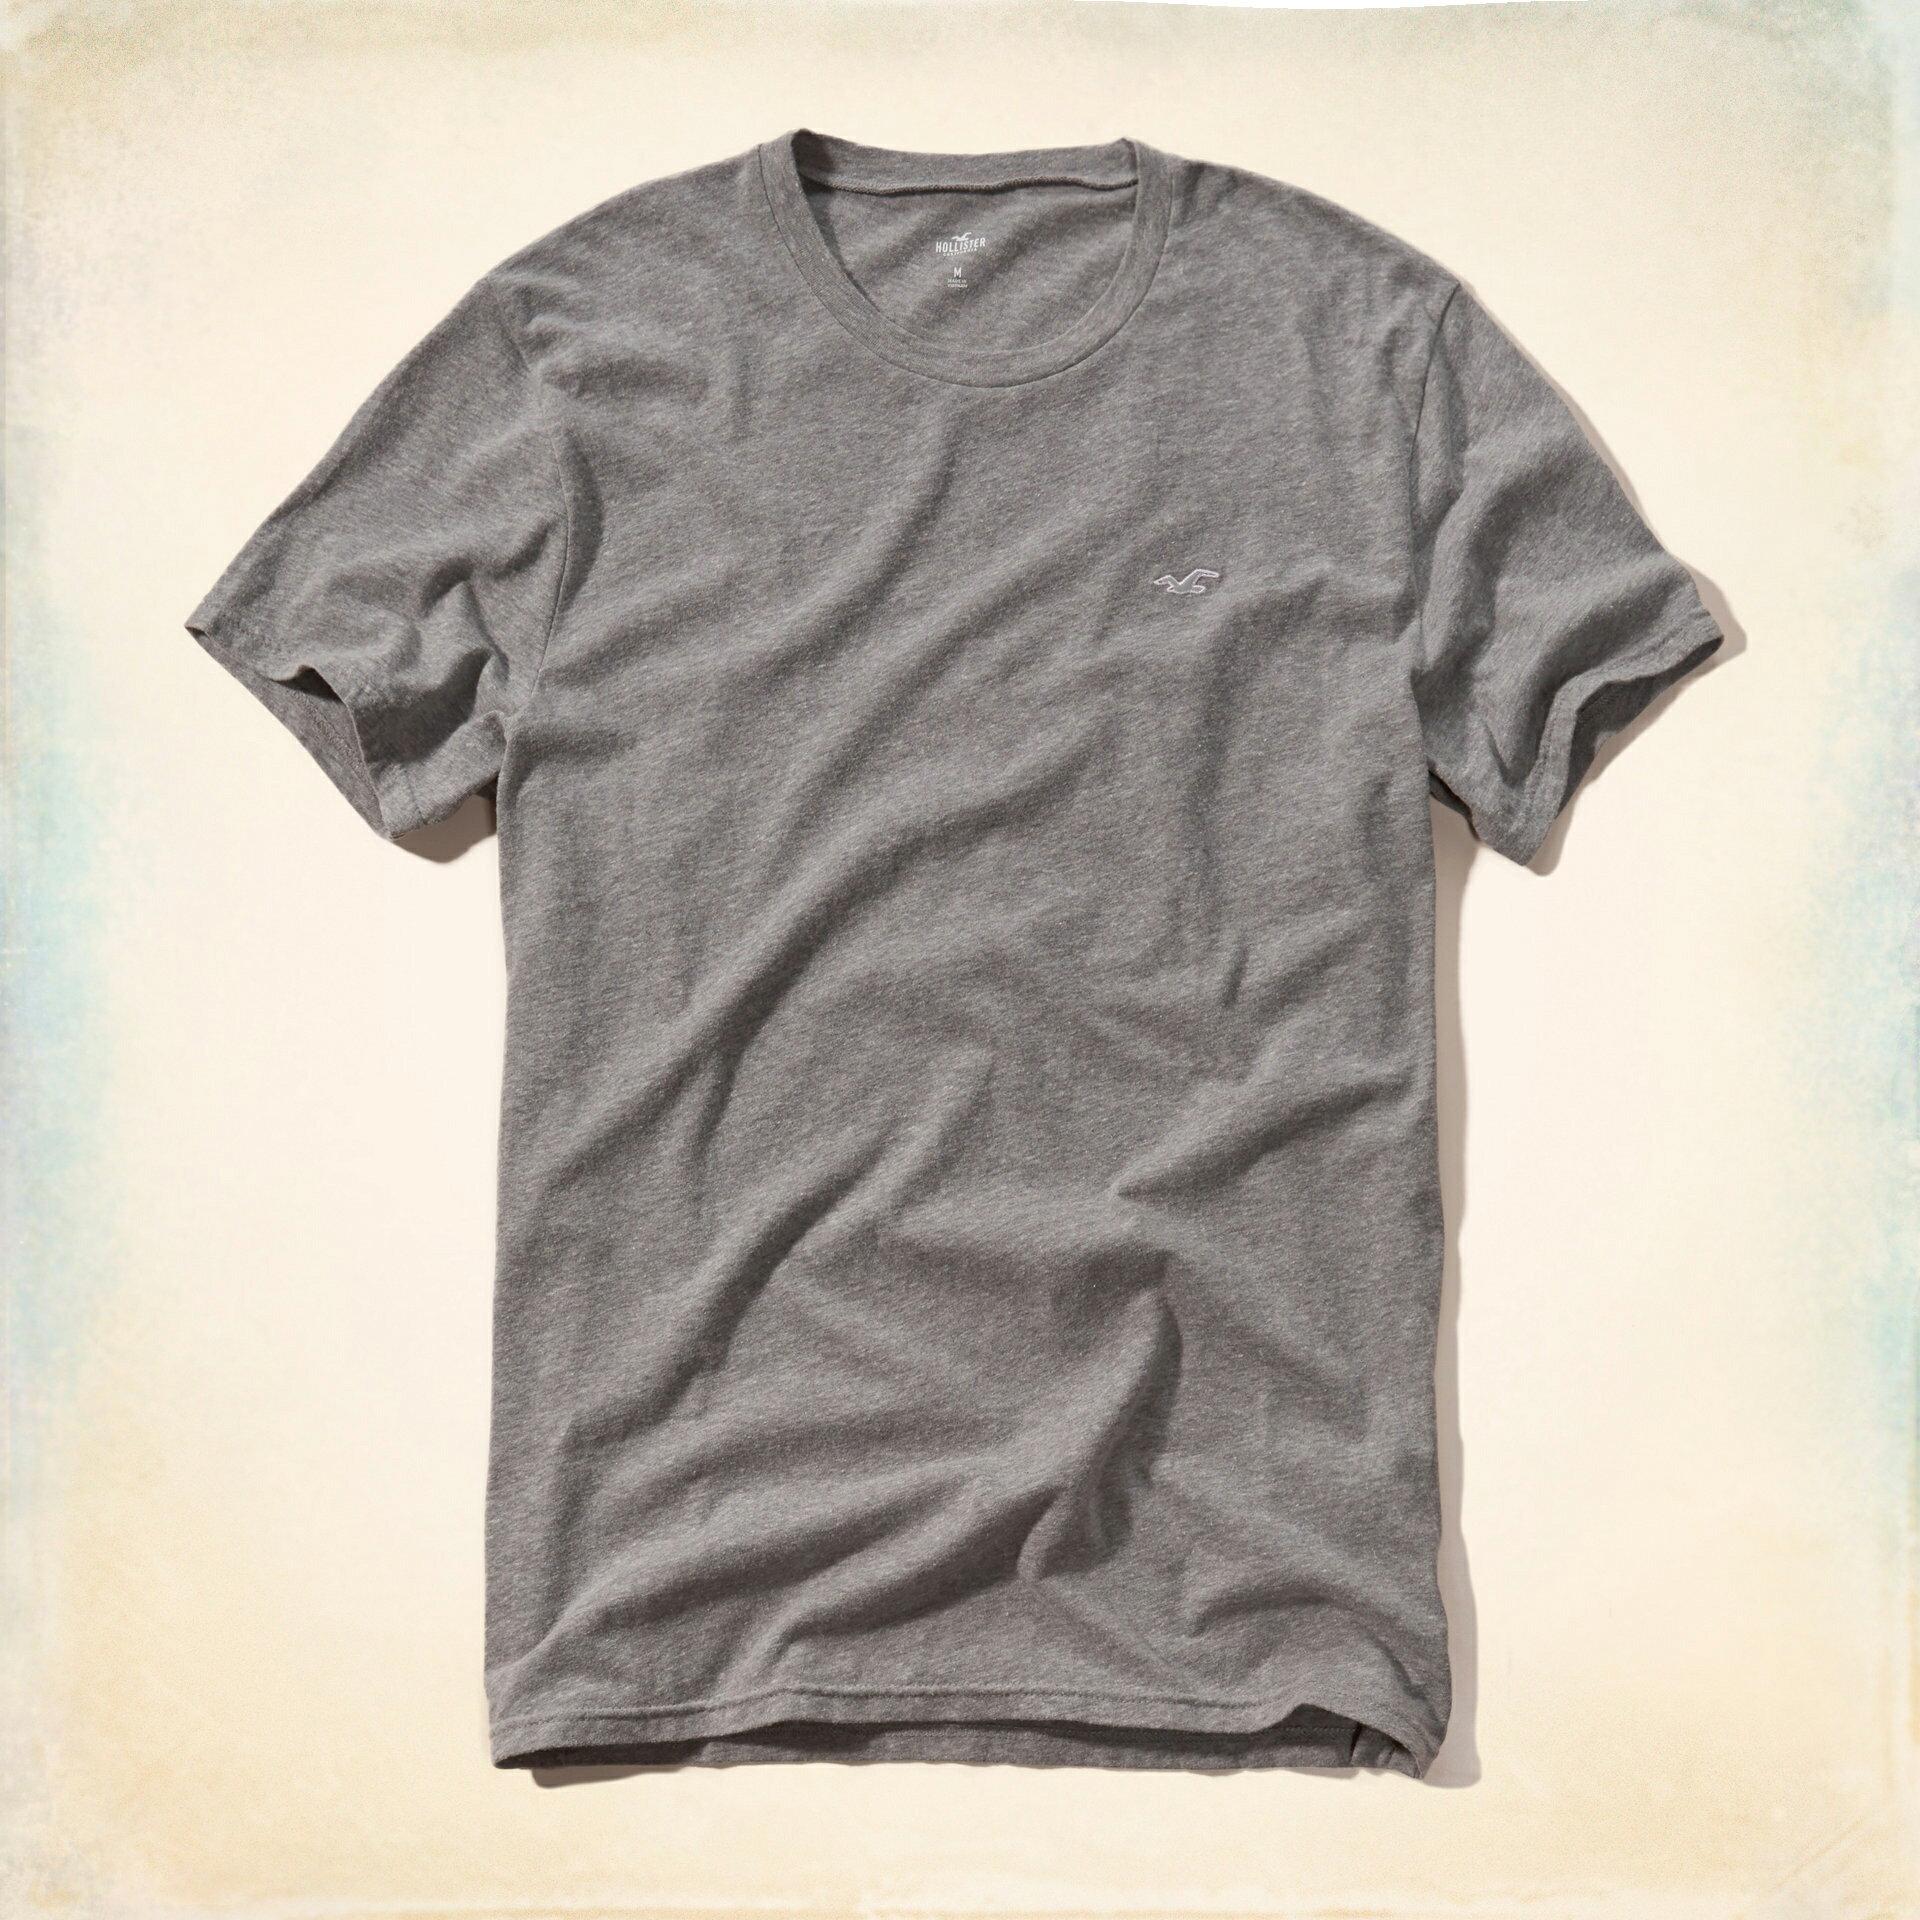 美國百分百【Hollister Co.】T恤 HCO 短袖 T-shirt 海鷗 淺灰色 logo 素T XL E959